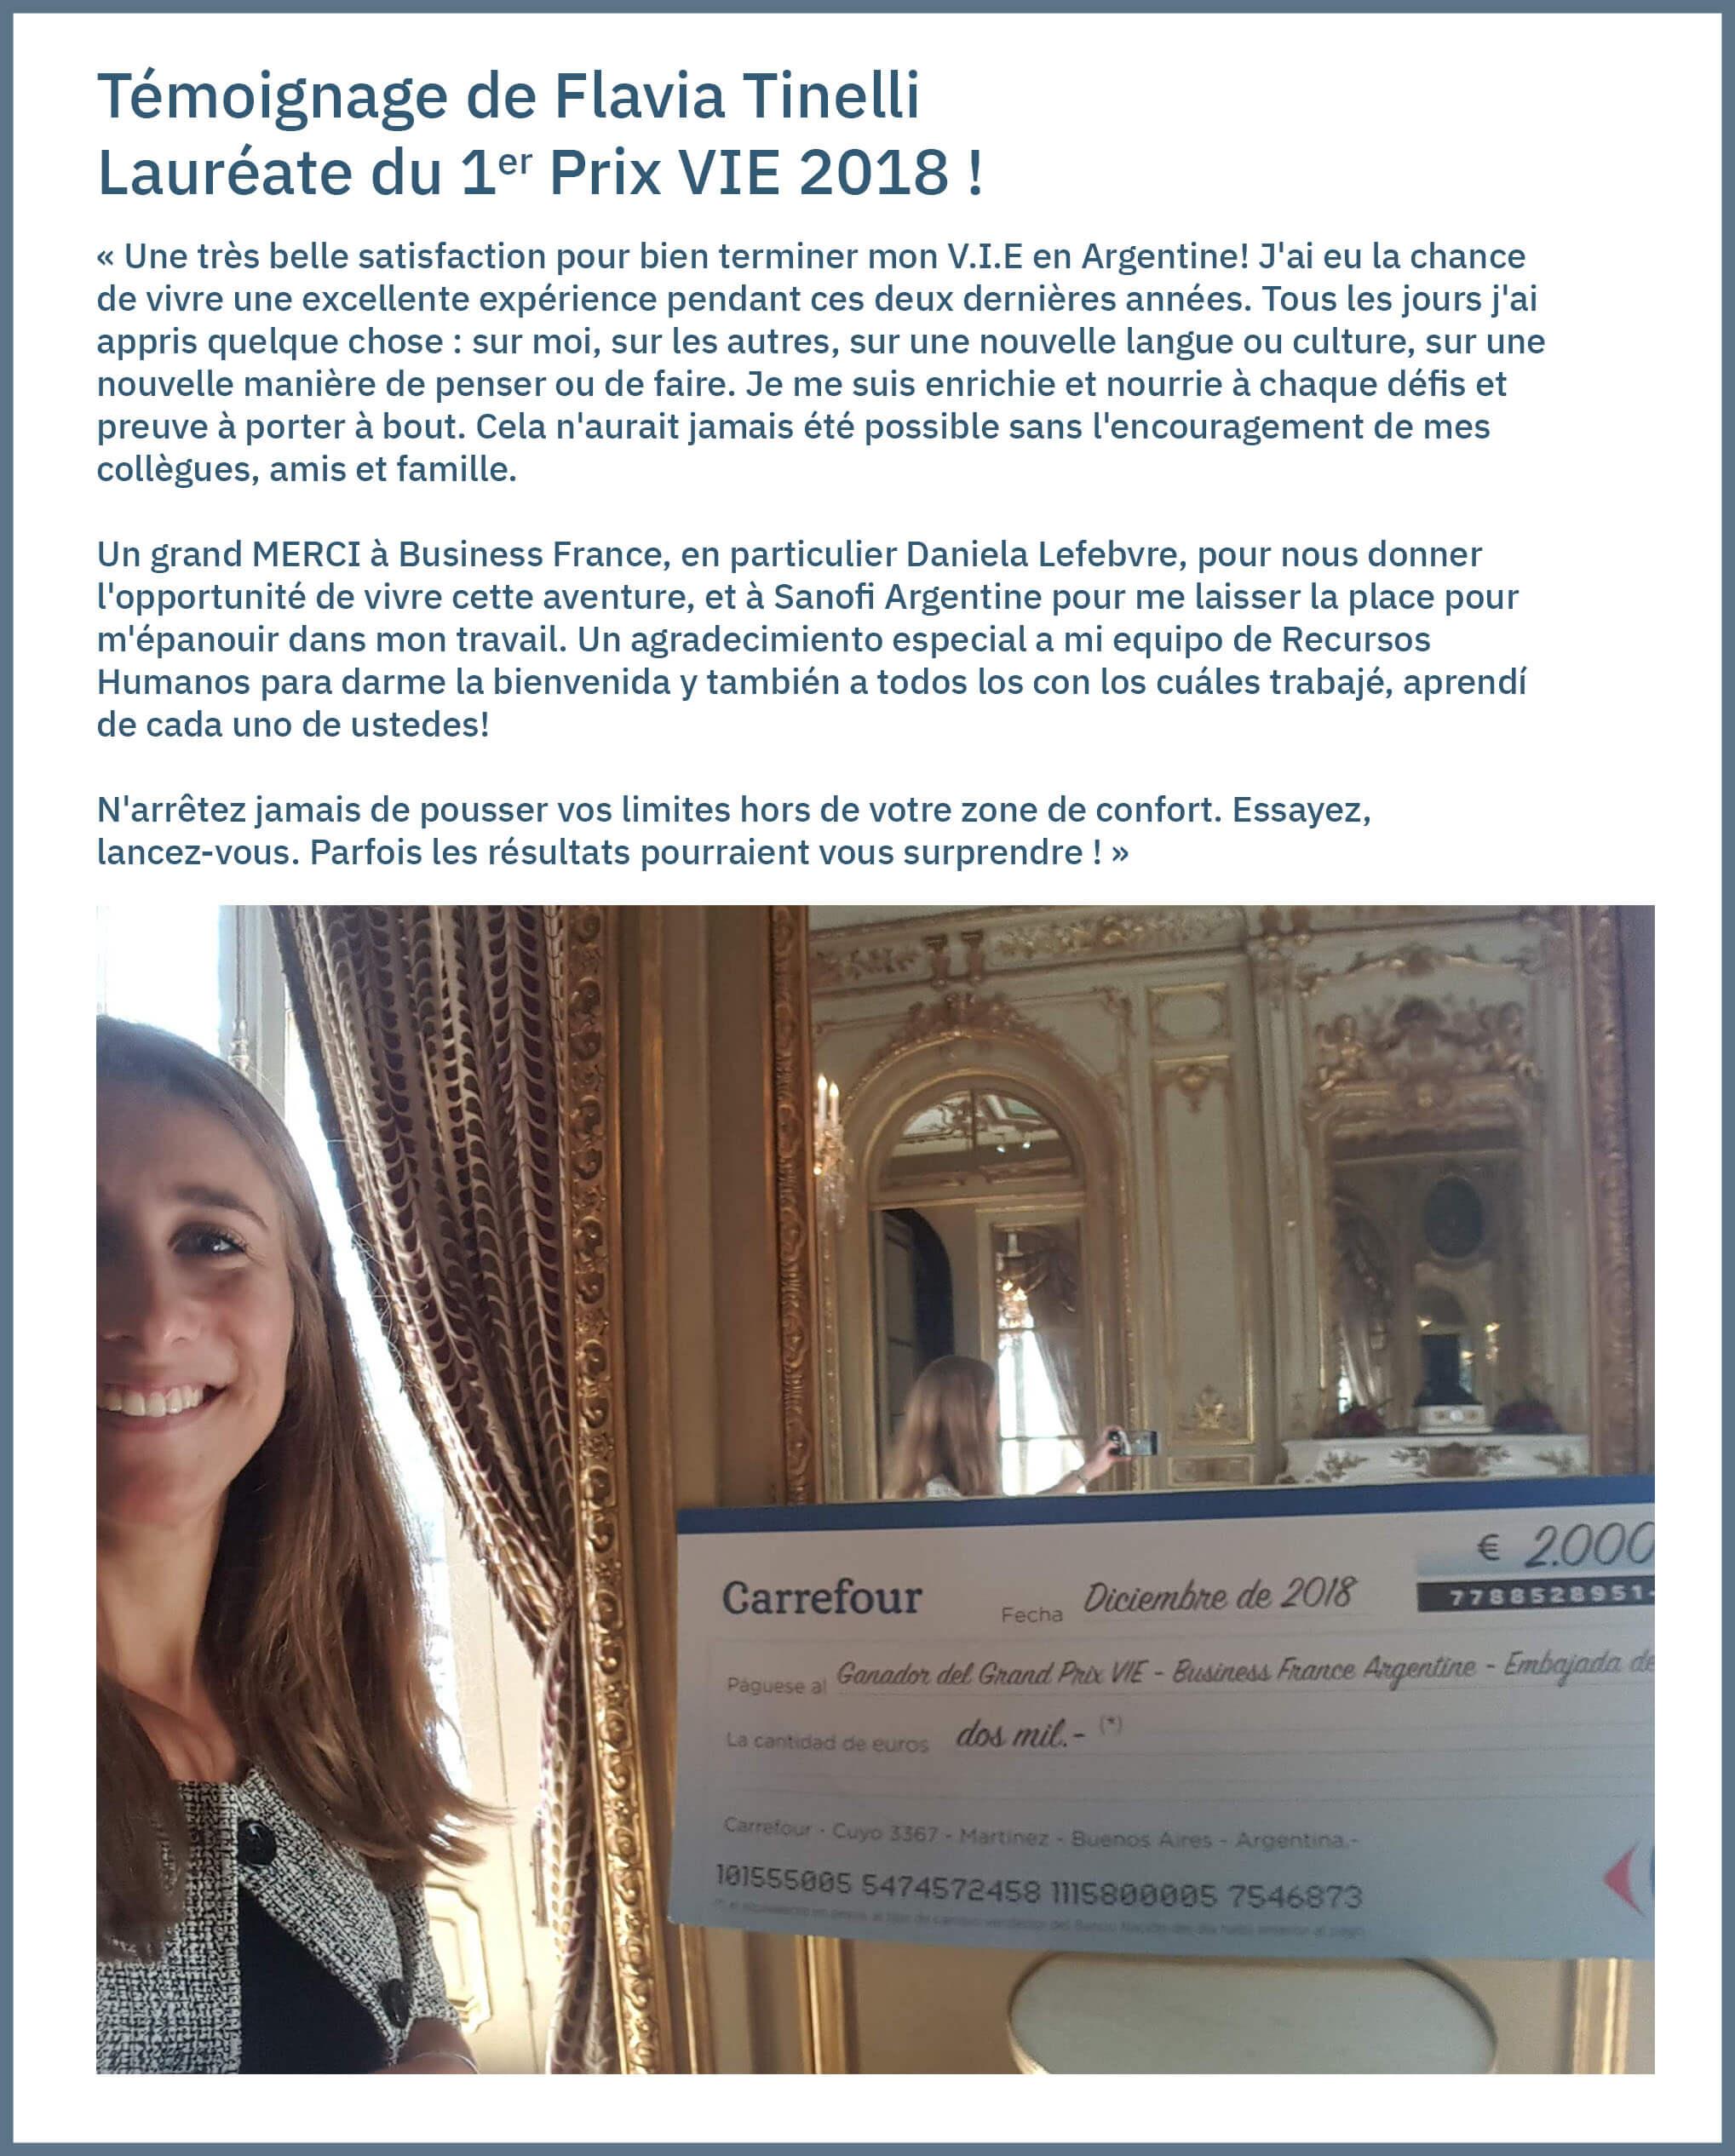 Témoignage de Flavia Tinelli Lauréate du Grand Prix V.I.E Argentine 2018